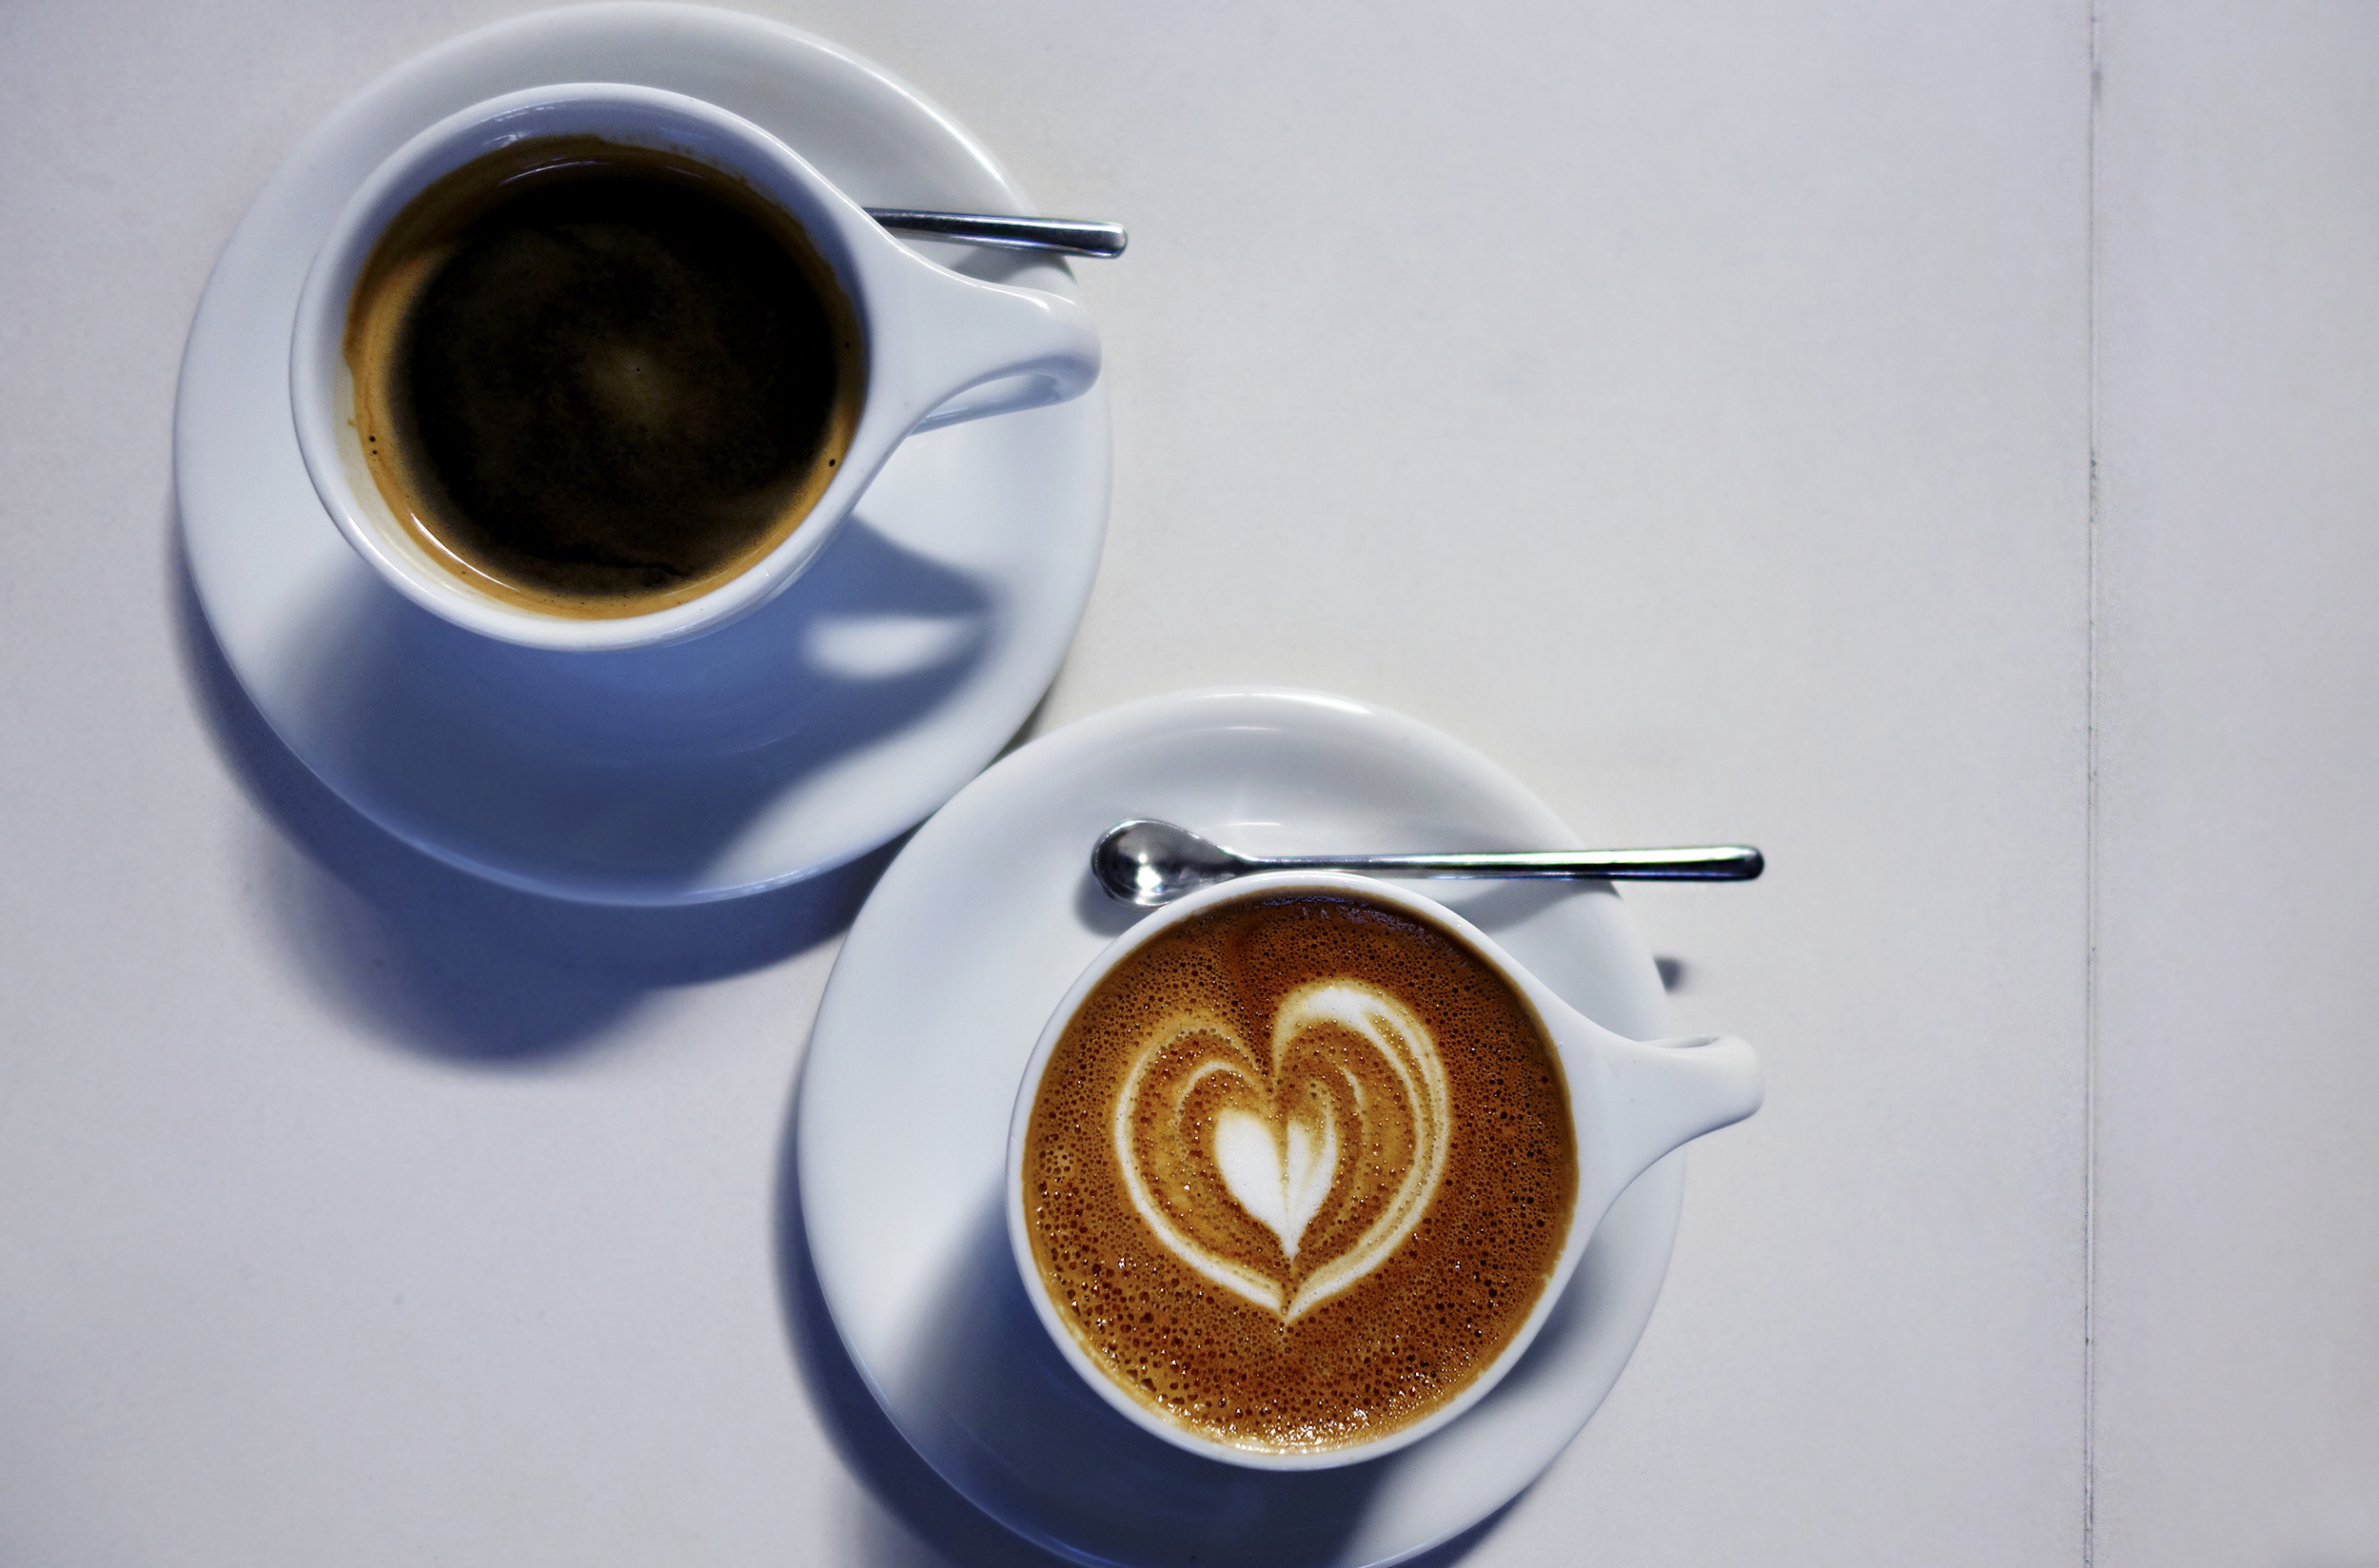 Americano on top, cappuccino bottom